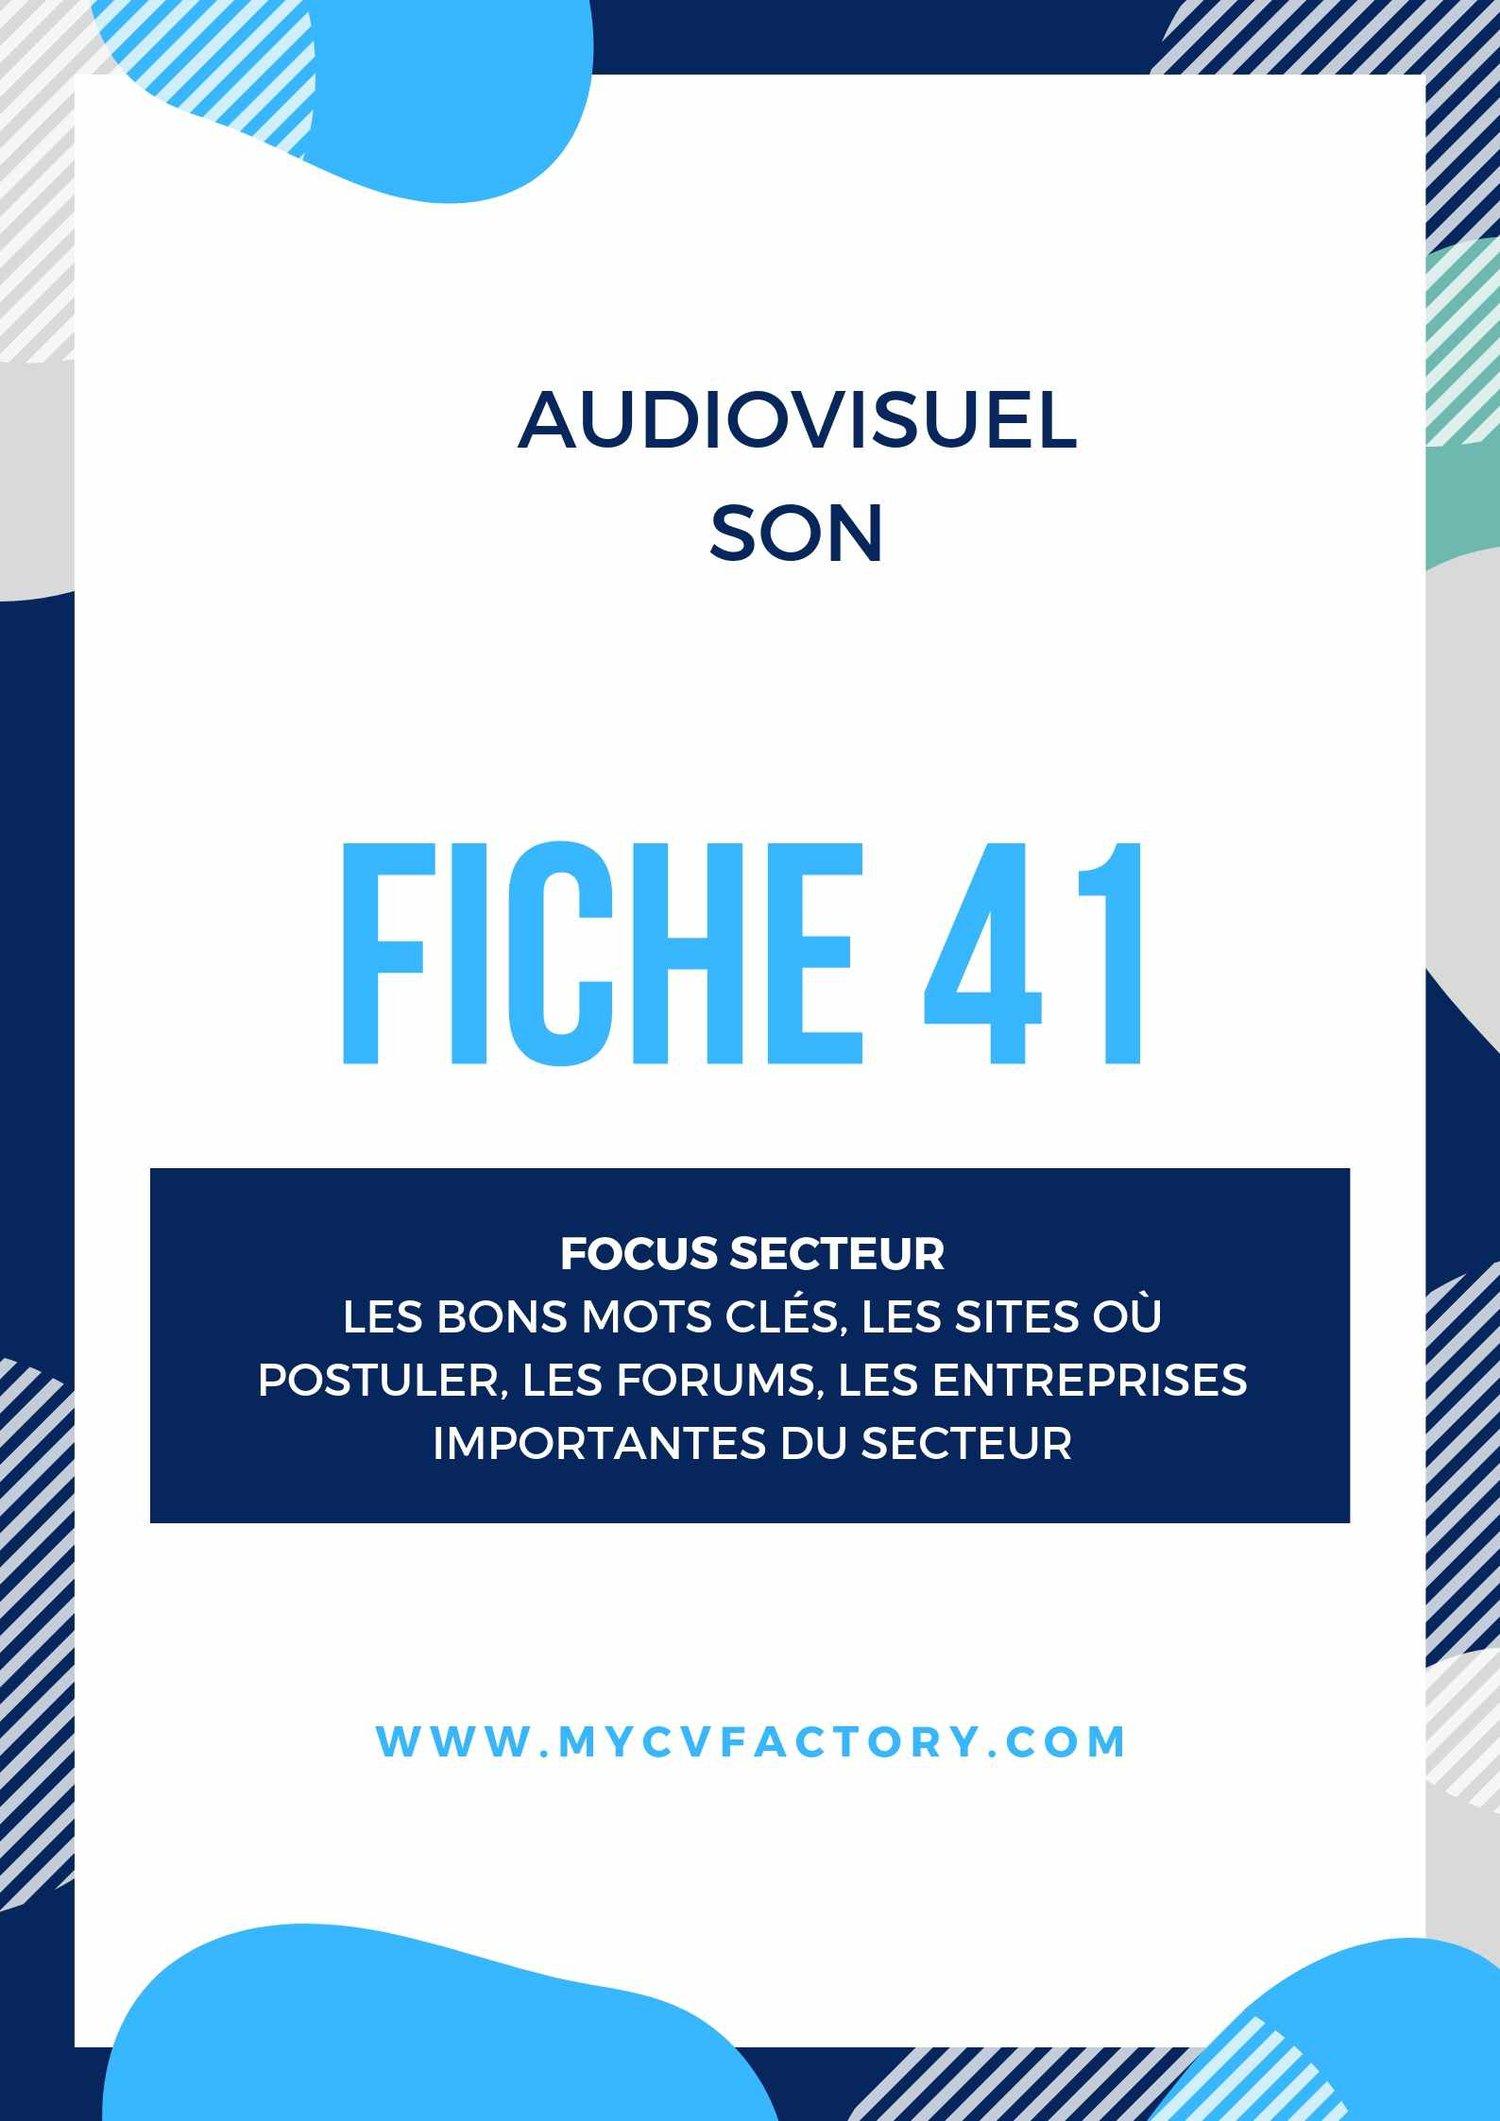 CV original audiovisuel